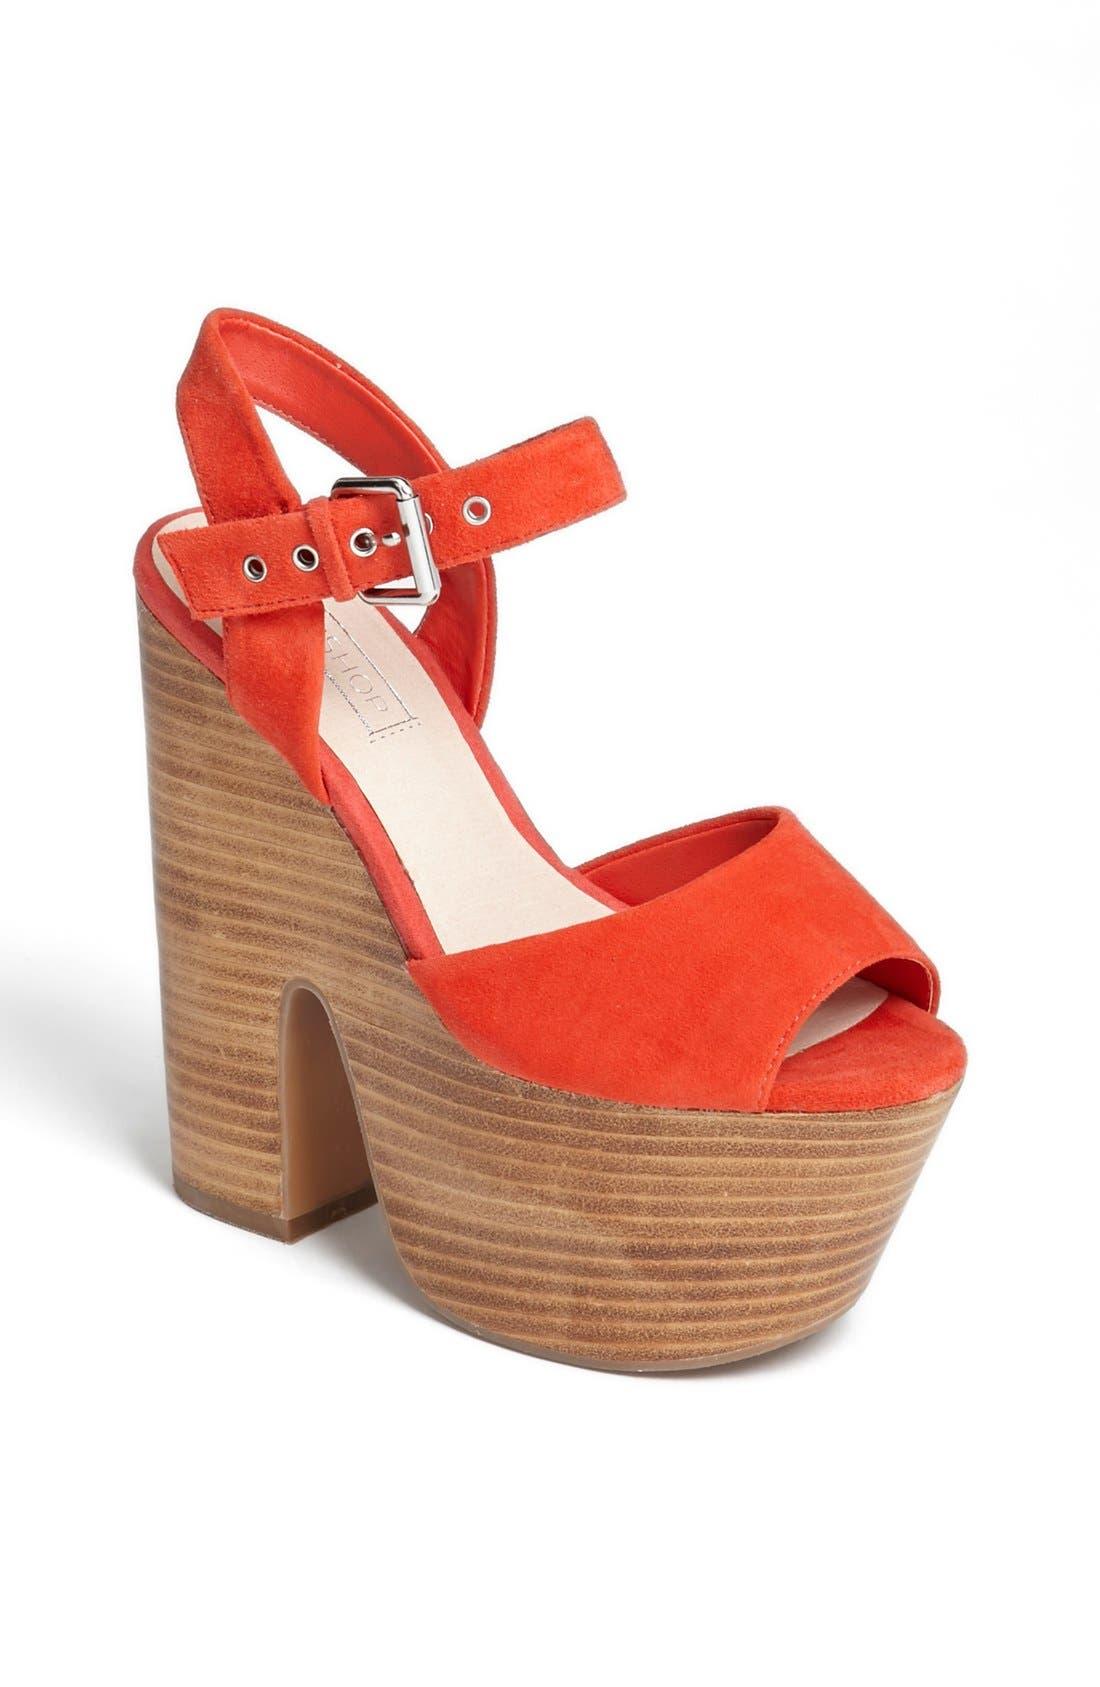 Main Image - Topshop 'Lassie' Platform Sandal